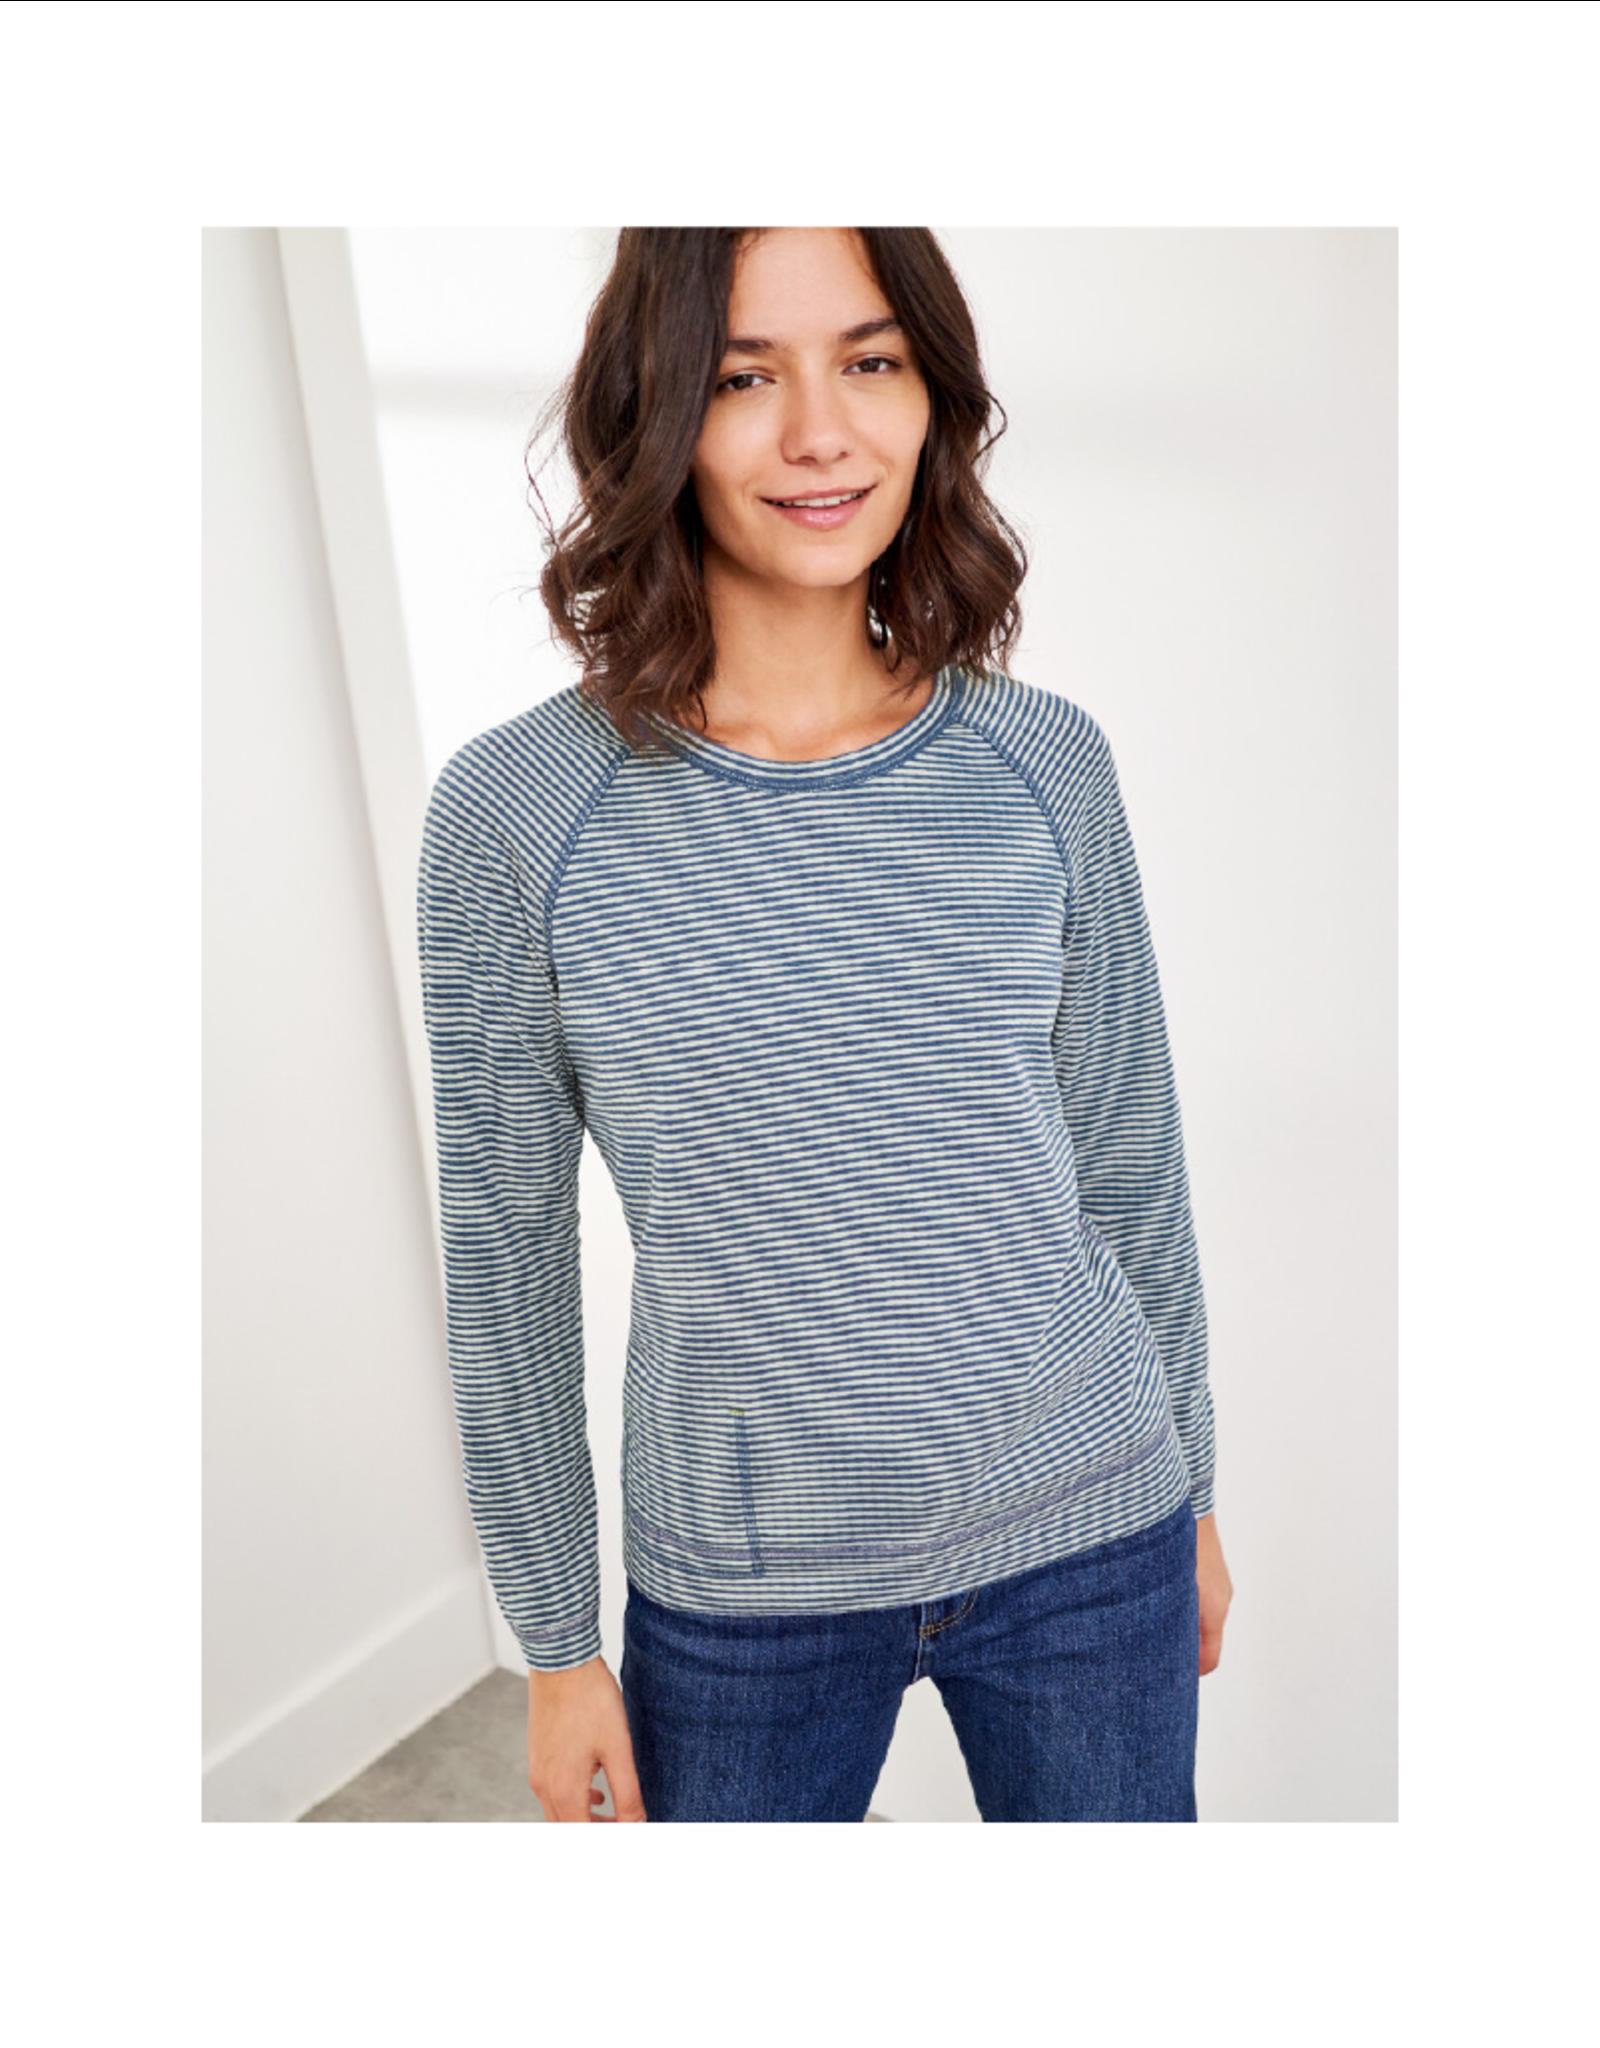 White Stuff Stripe Reversible Sweater